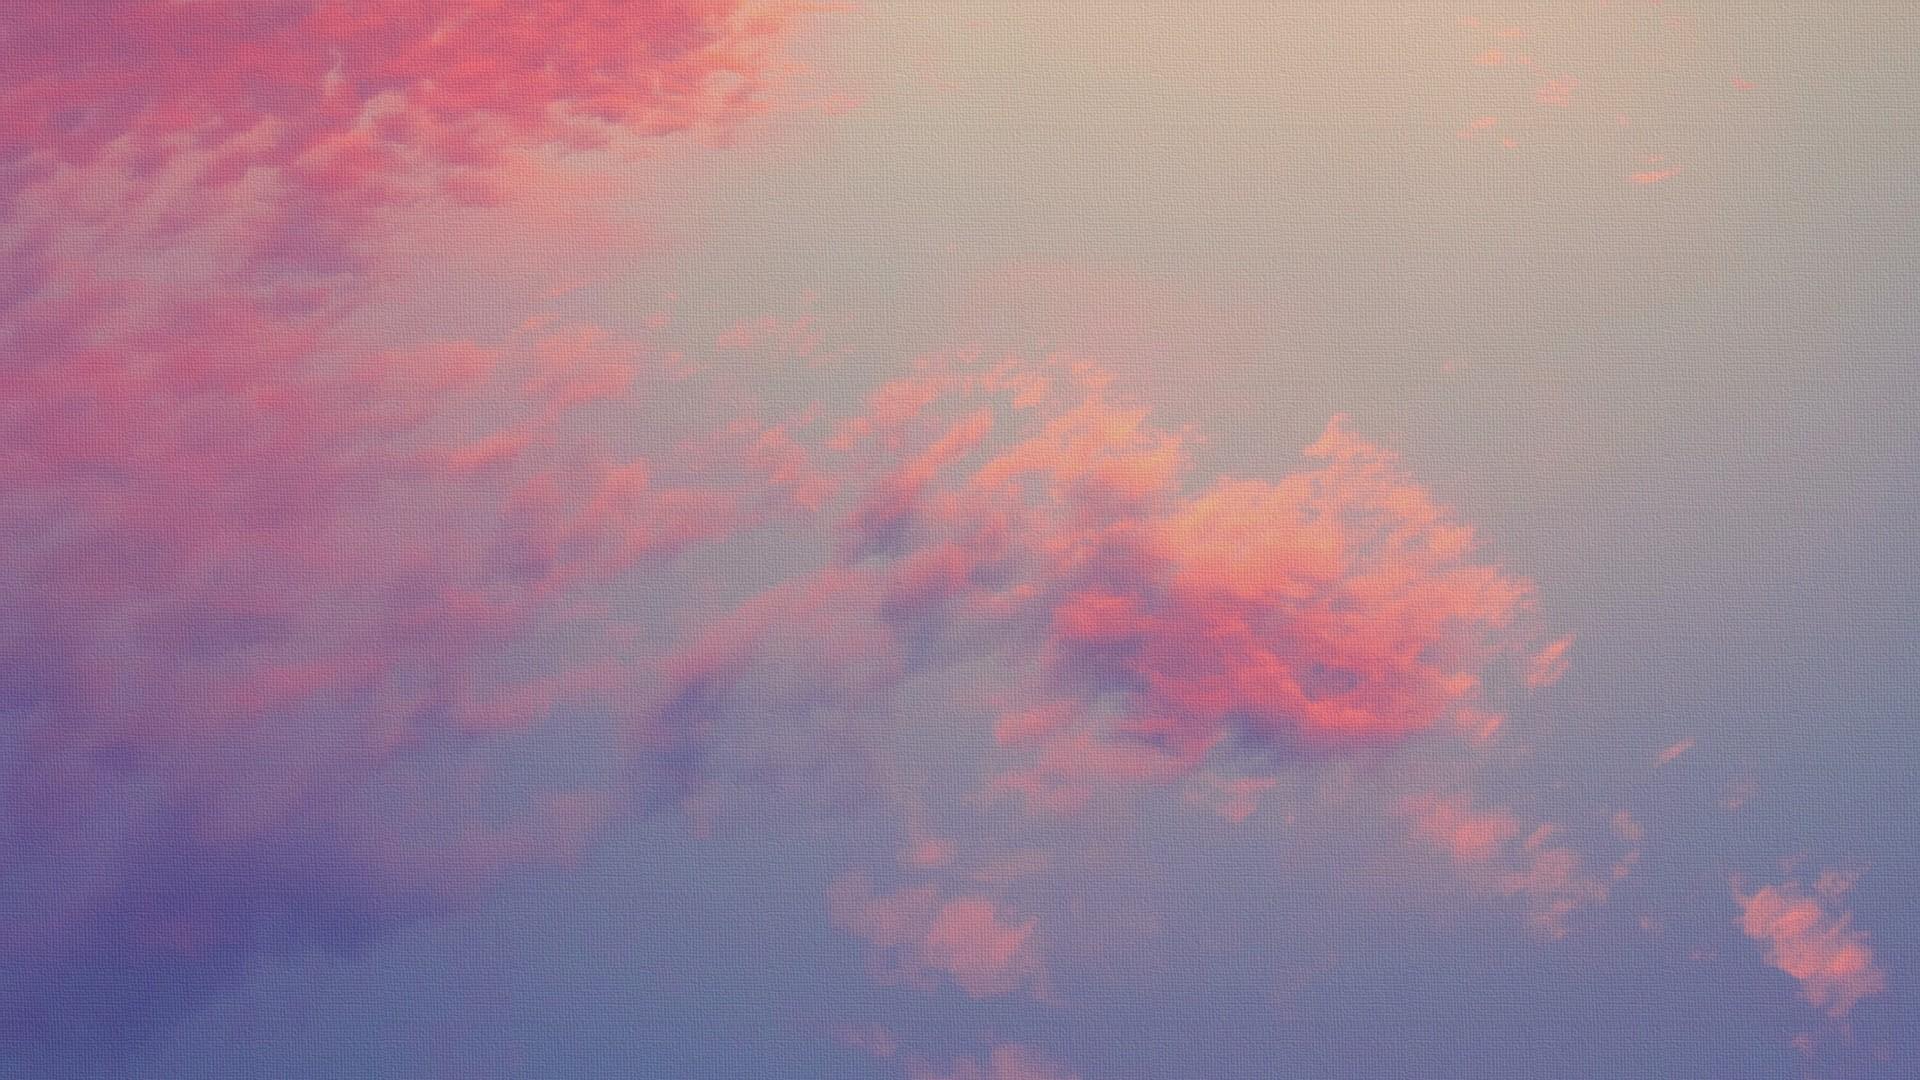 Pink Cloud a wallpaper